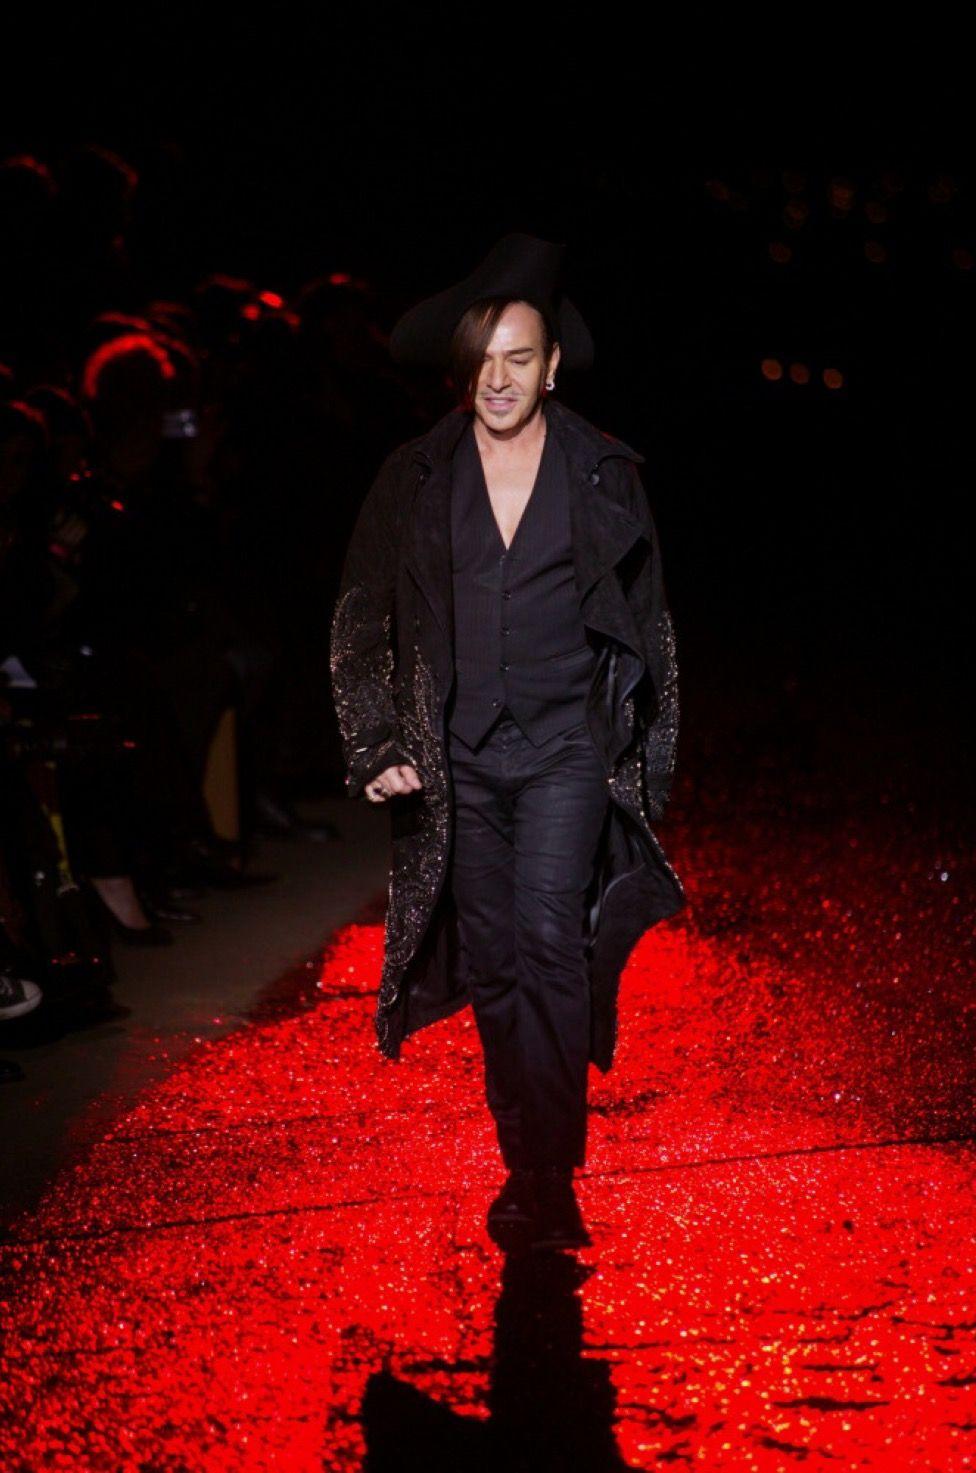 to wear - Galliano john interview in vanity fair video